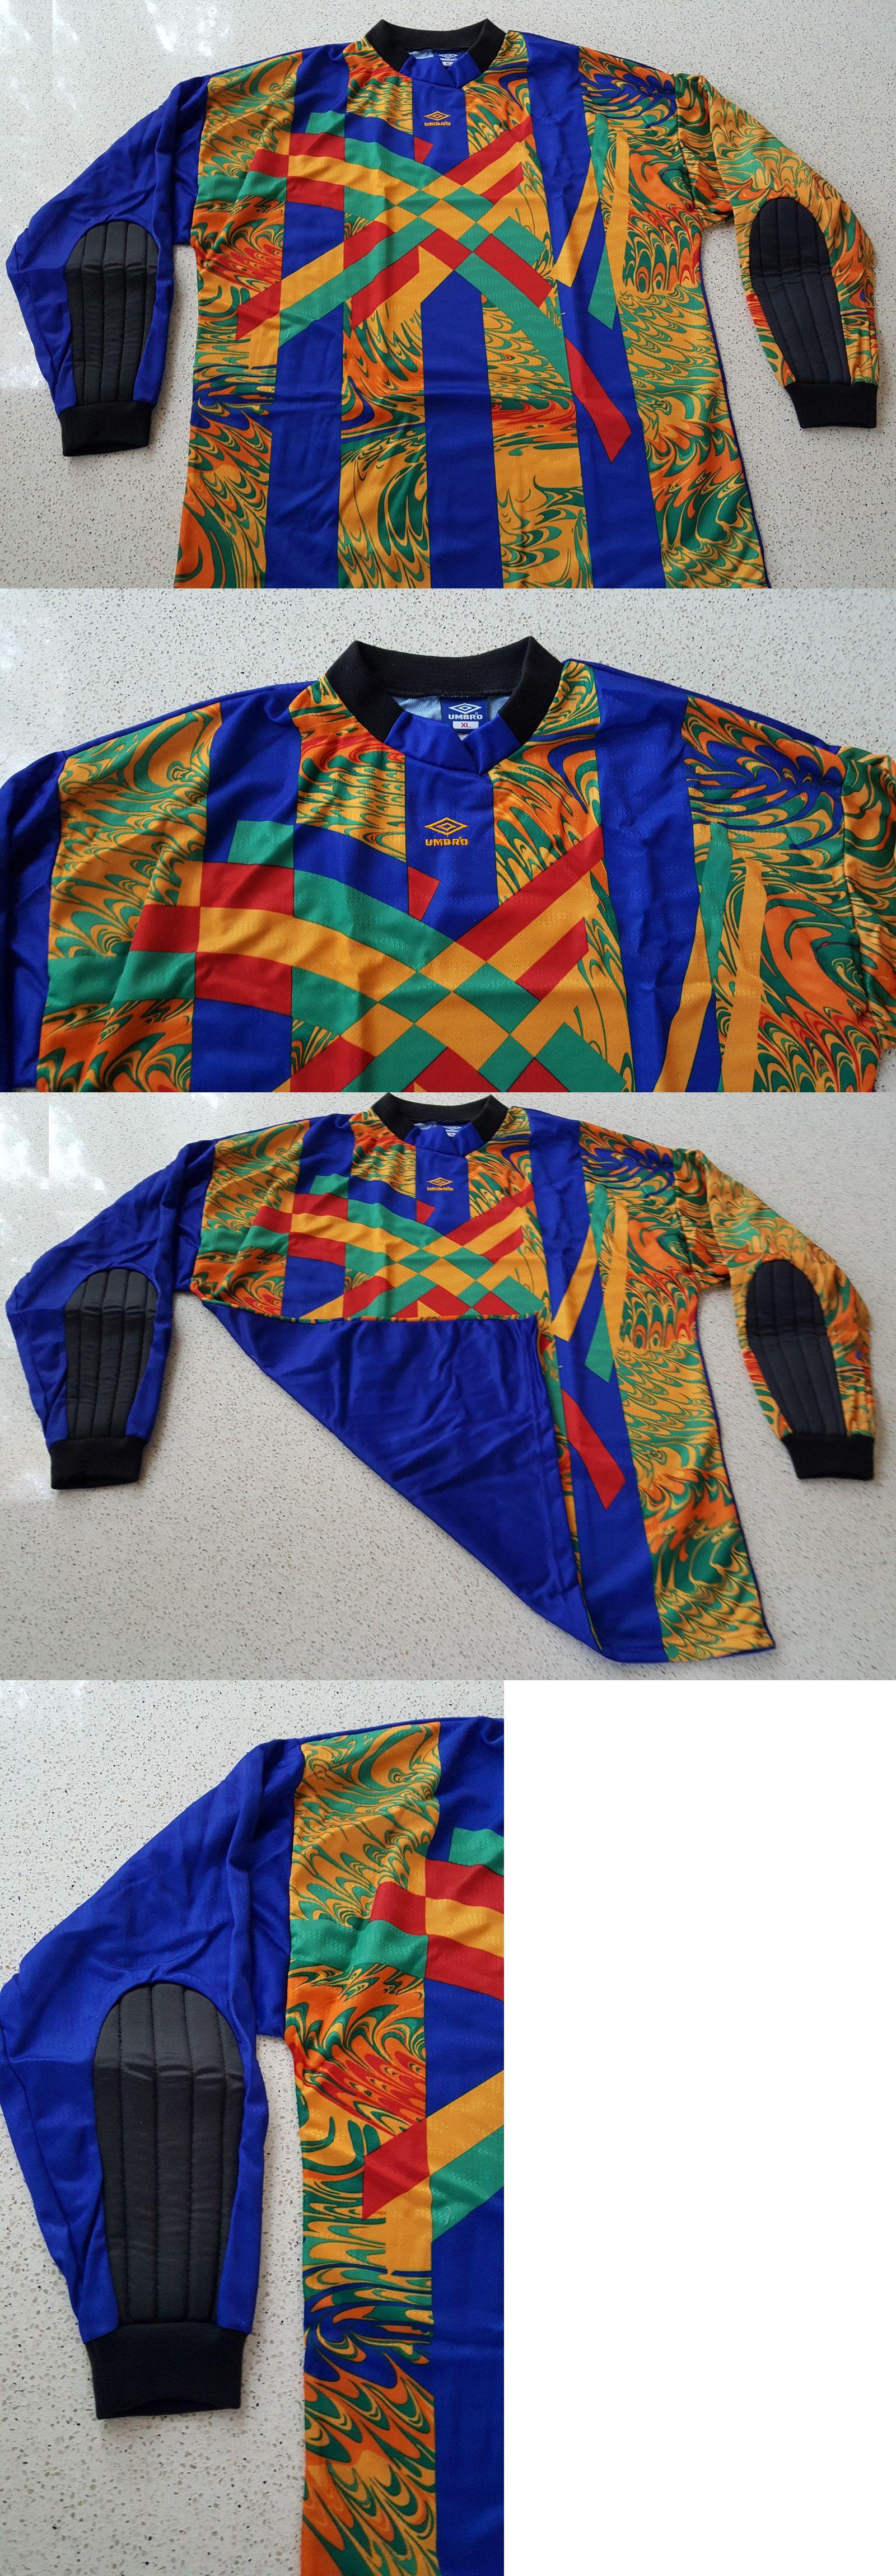 7f8f454960a Umbro Goalkeeper Jersey Retro Vintage 90s ~ Padded ~ Adult XL Men